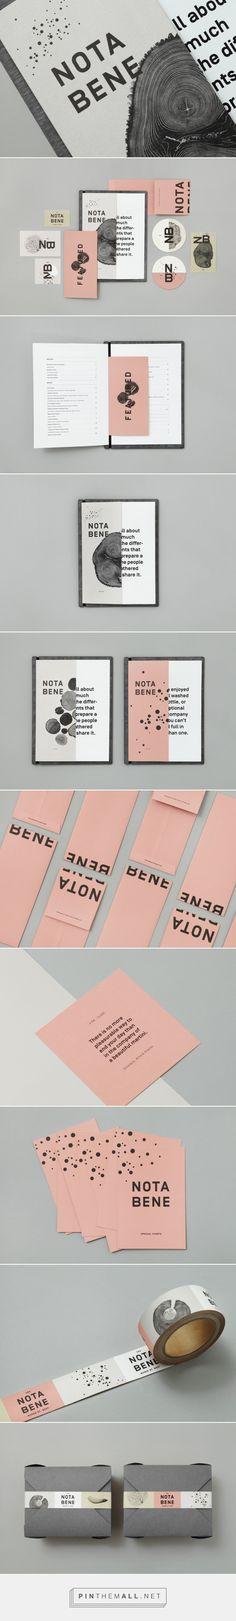 New Brand Identity for Nota Bene by Blok — BP&O - created via https://pinthemall.net